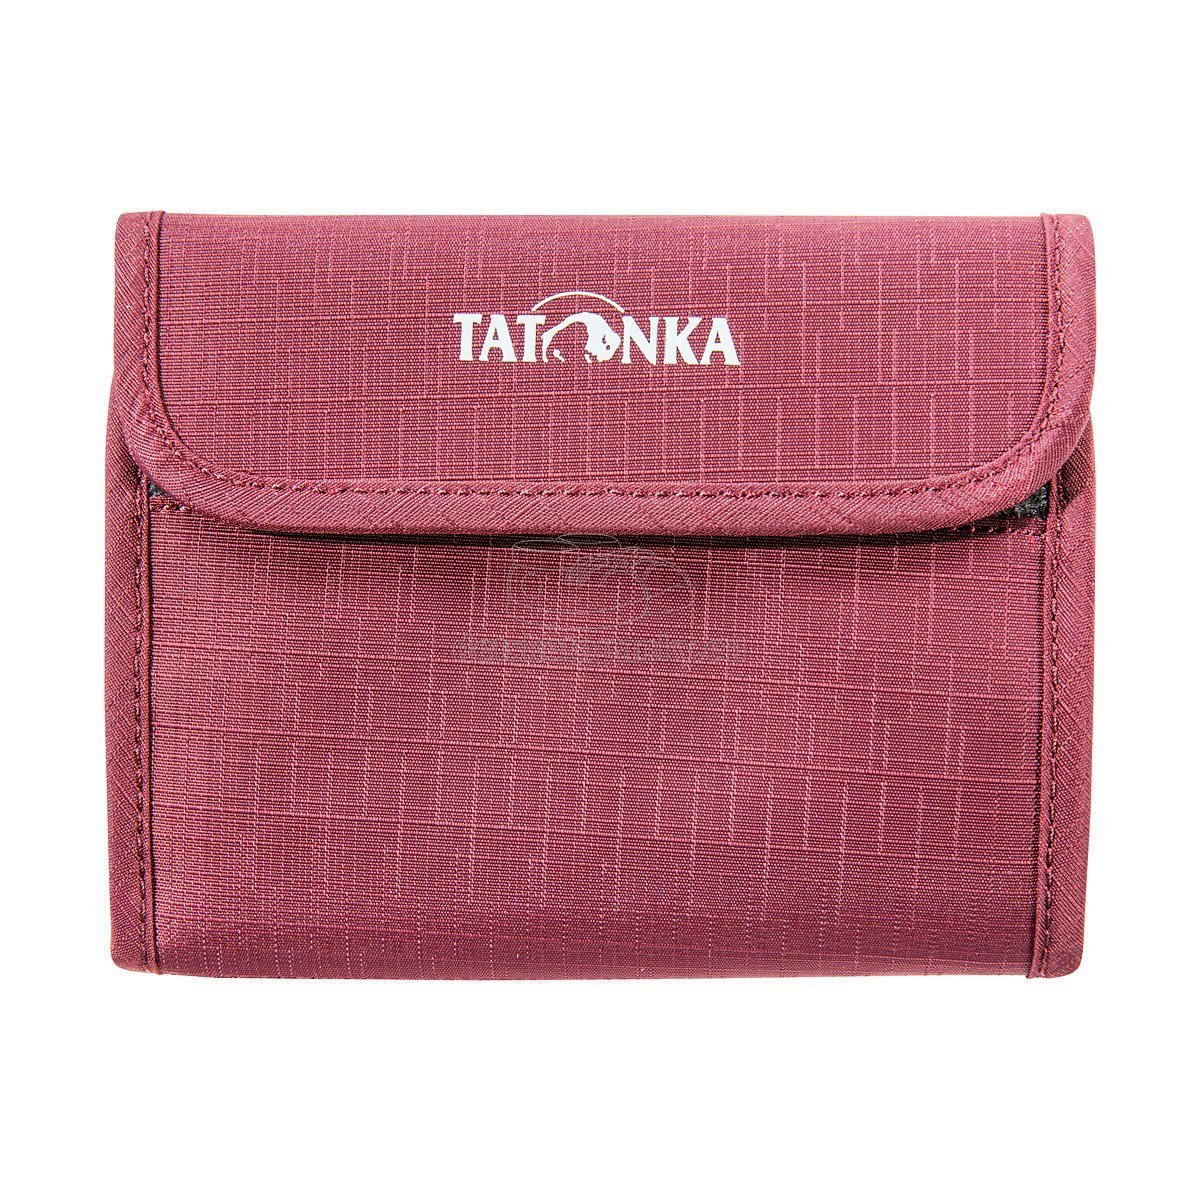 Tatonka Euro Wallet (bordeaux red)